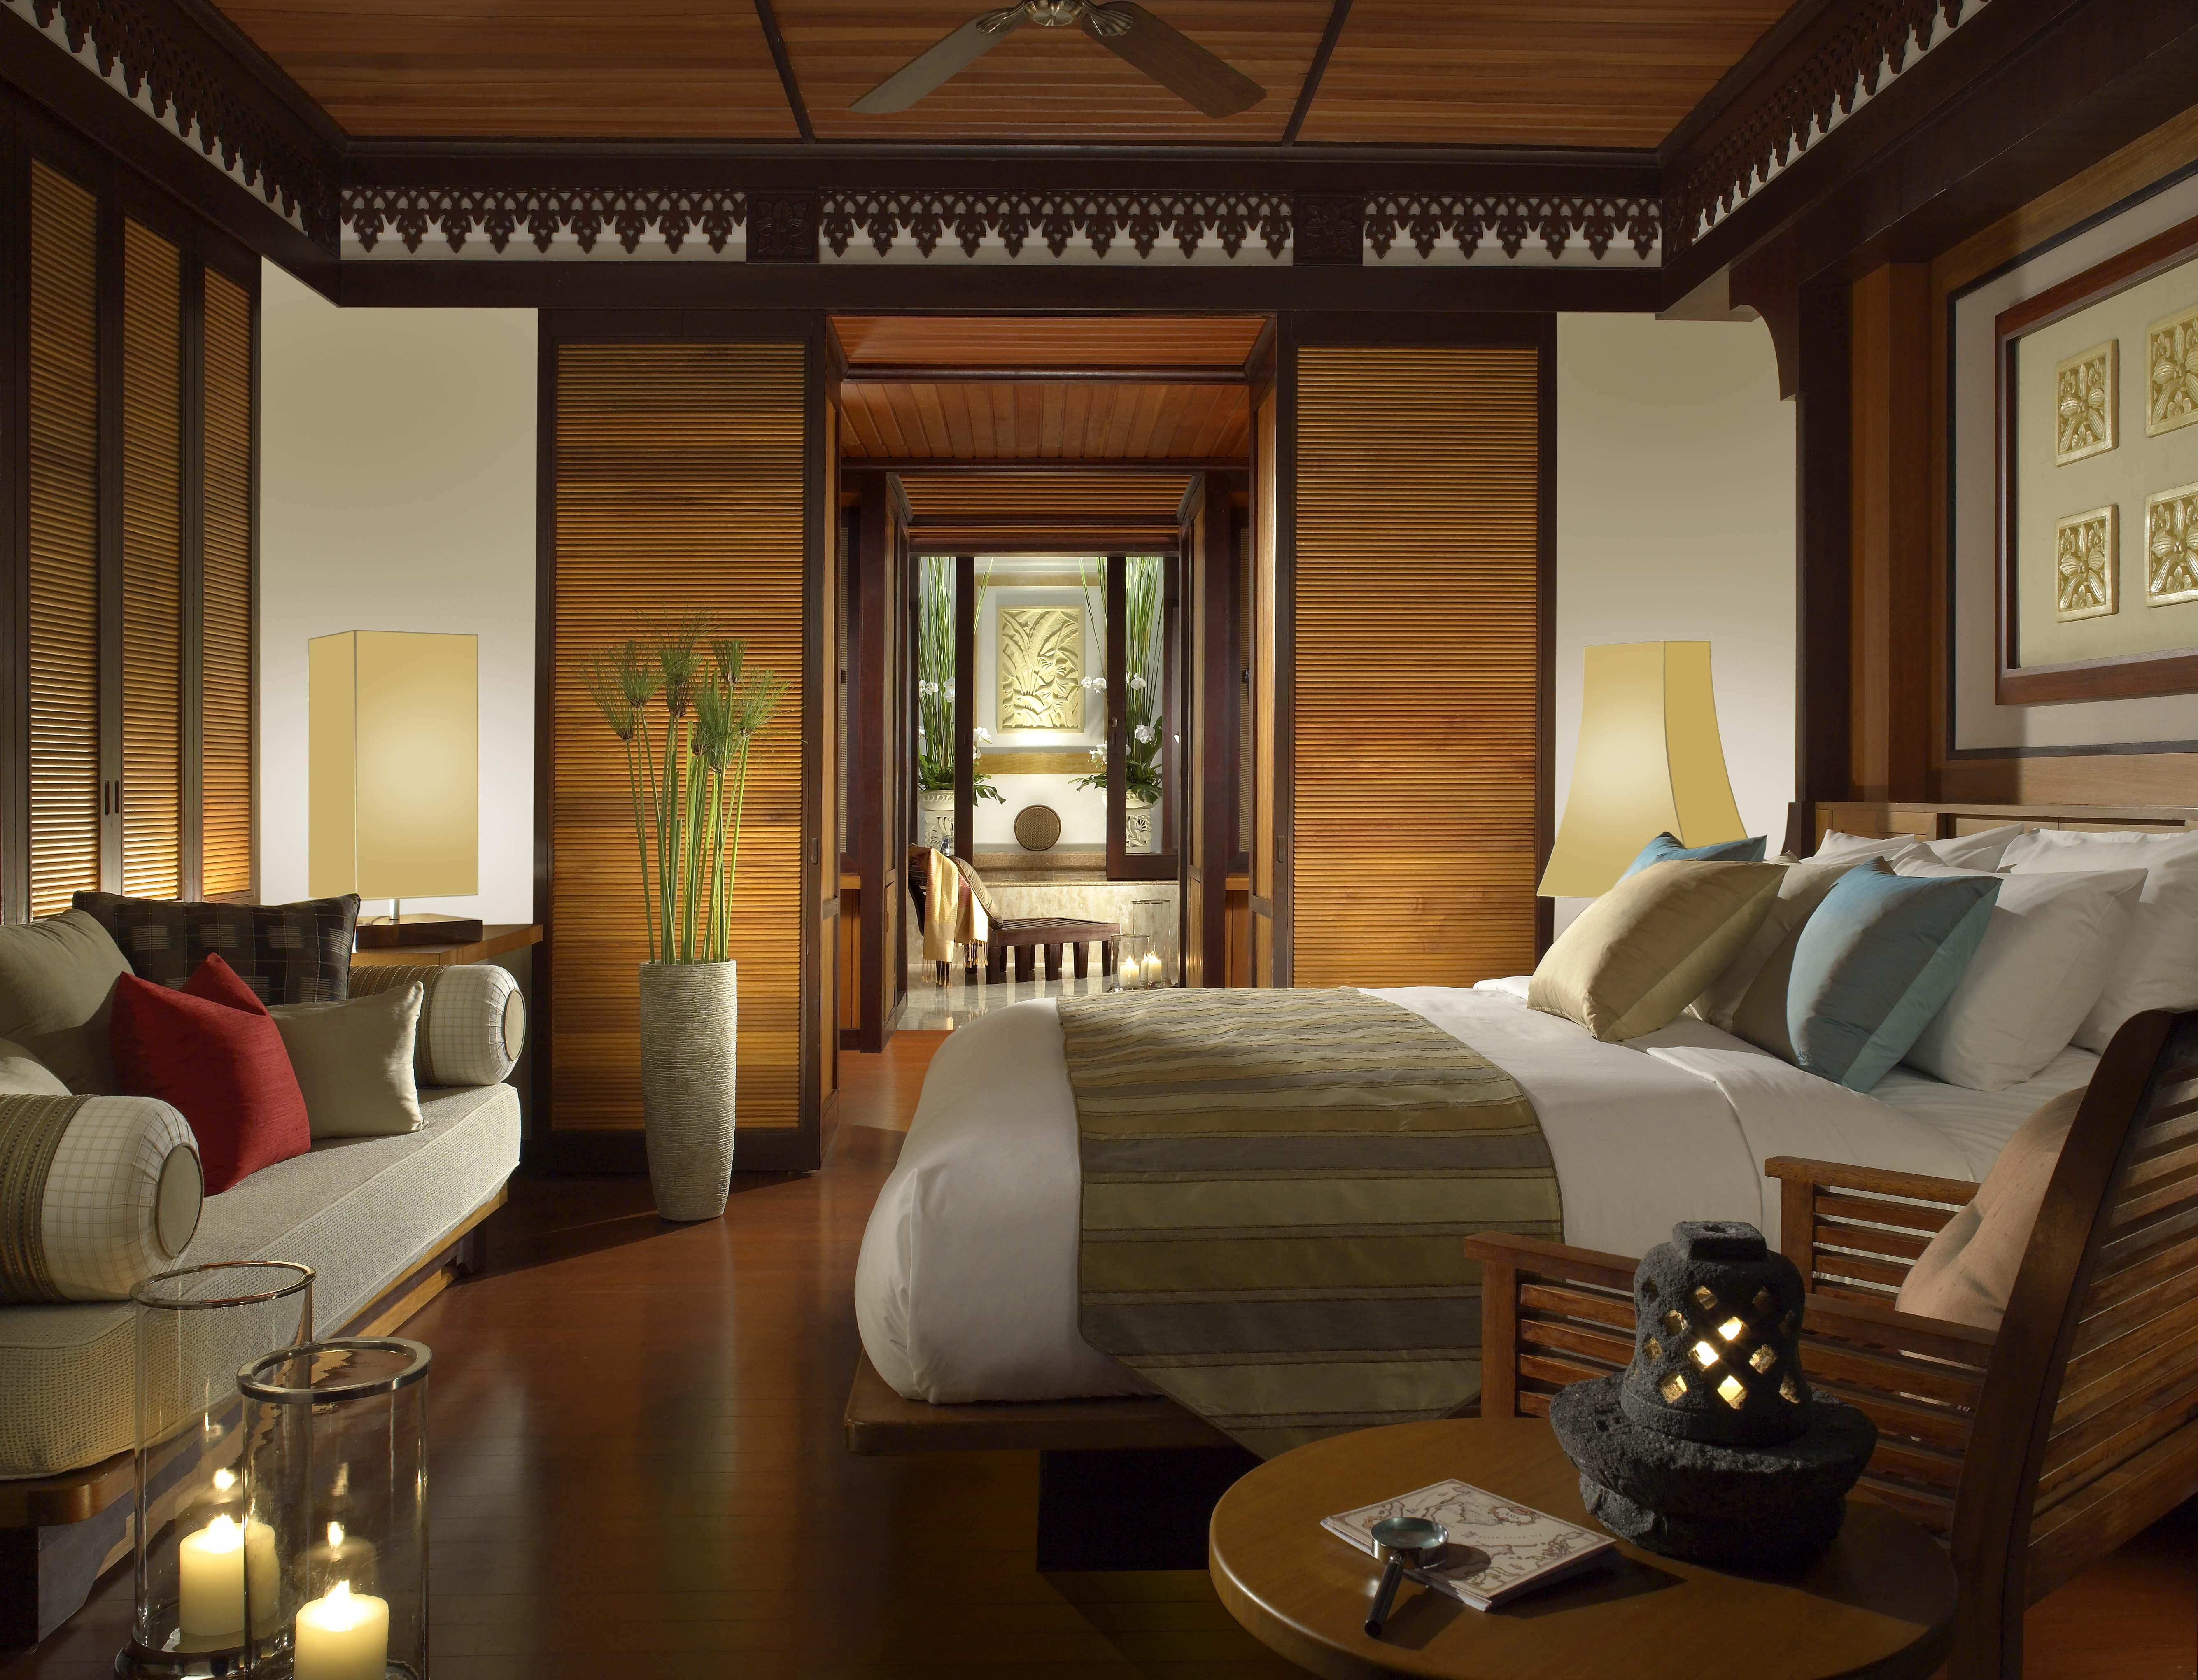 Pangkor laut resort luxury hotel in pangkor laut for Interieur villa design